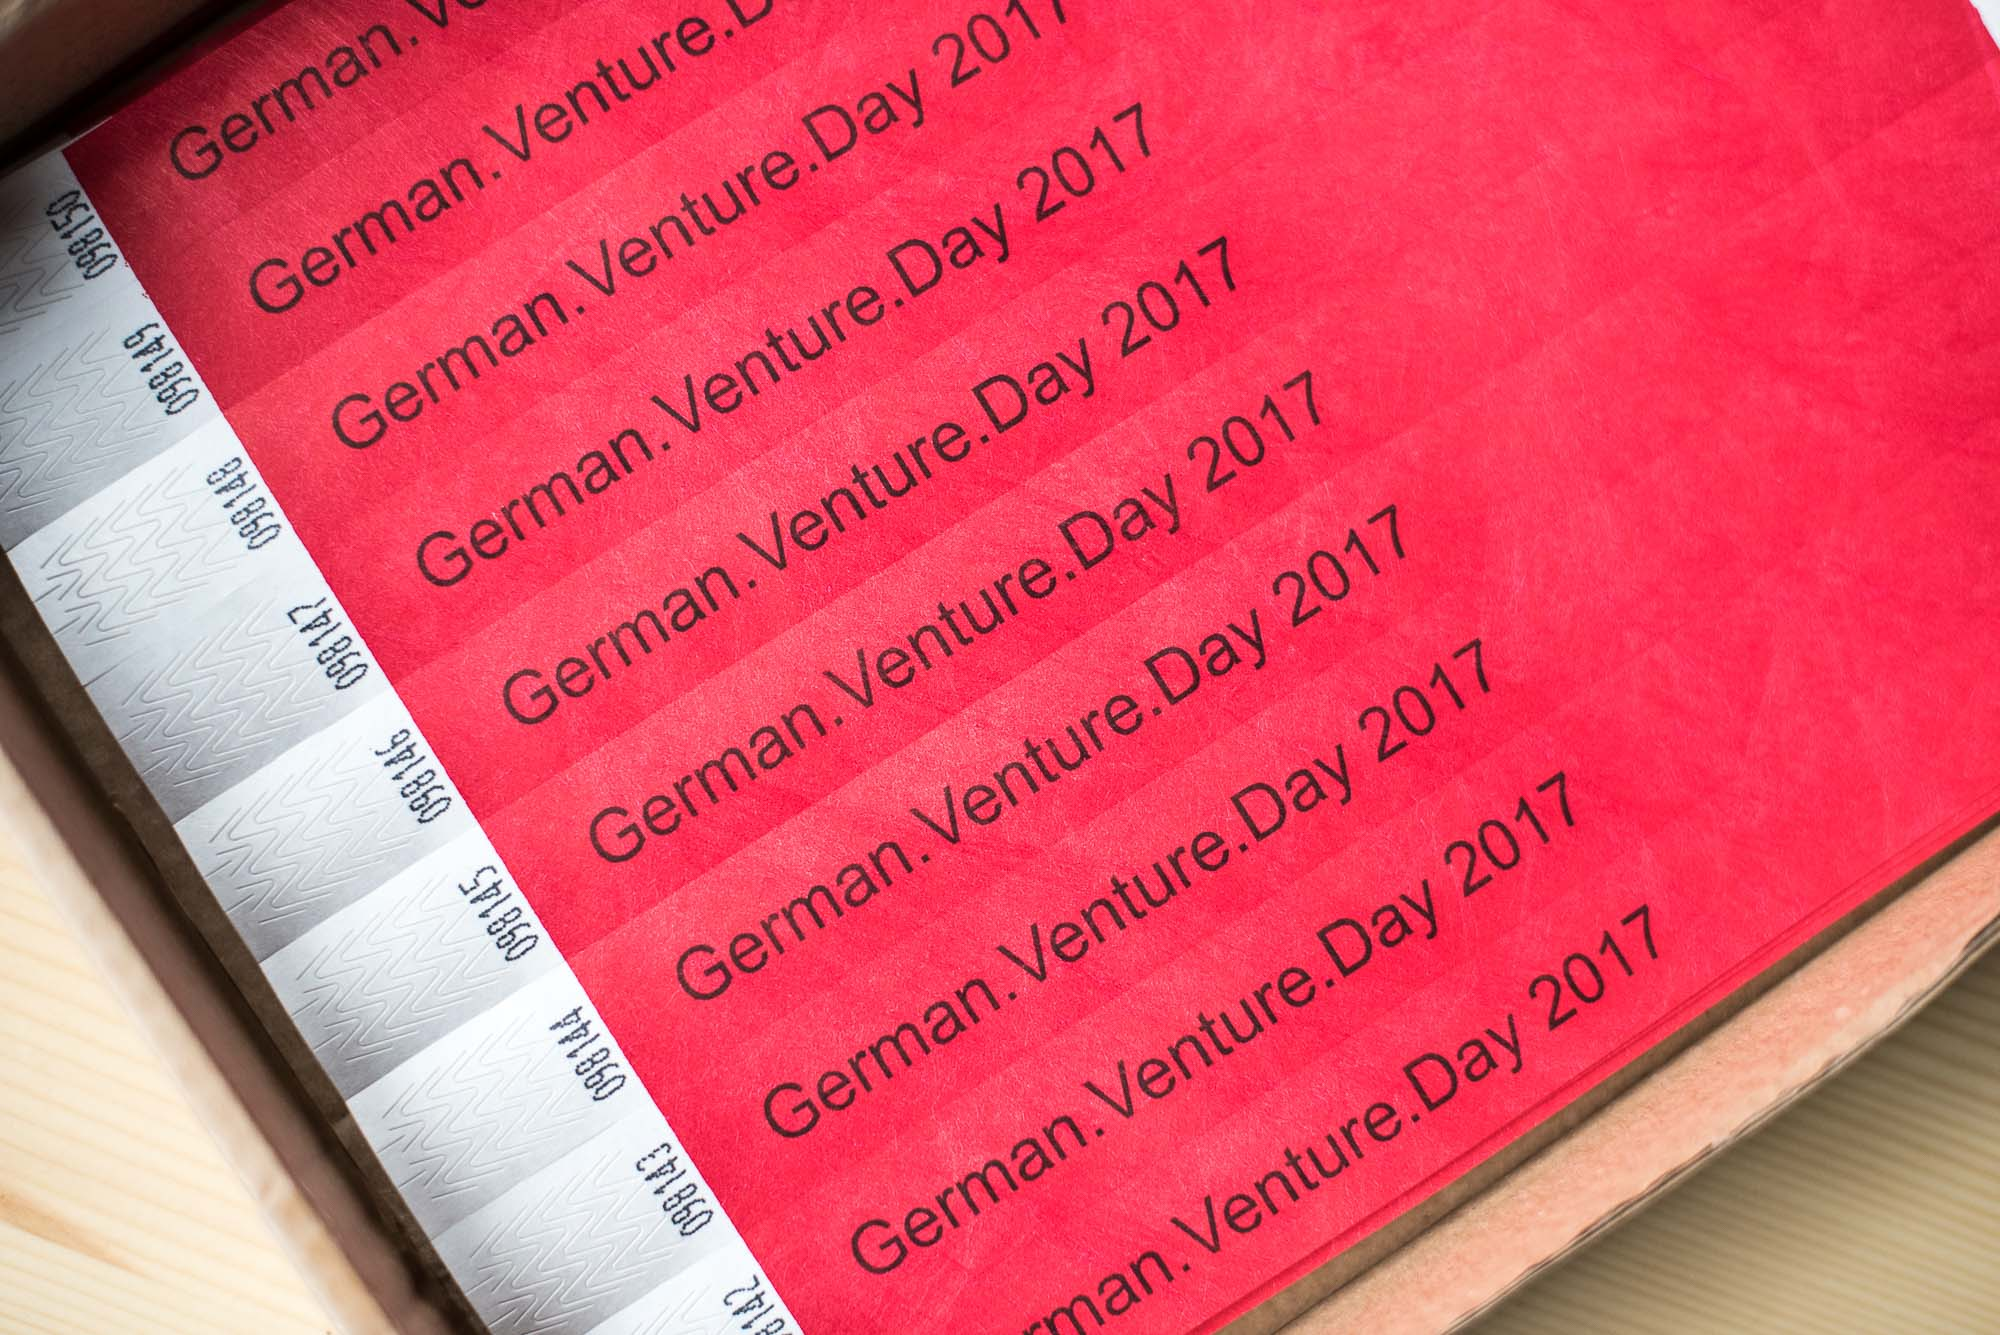 German Venture Day 2017